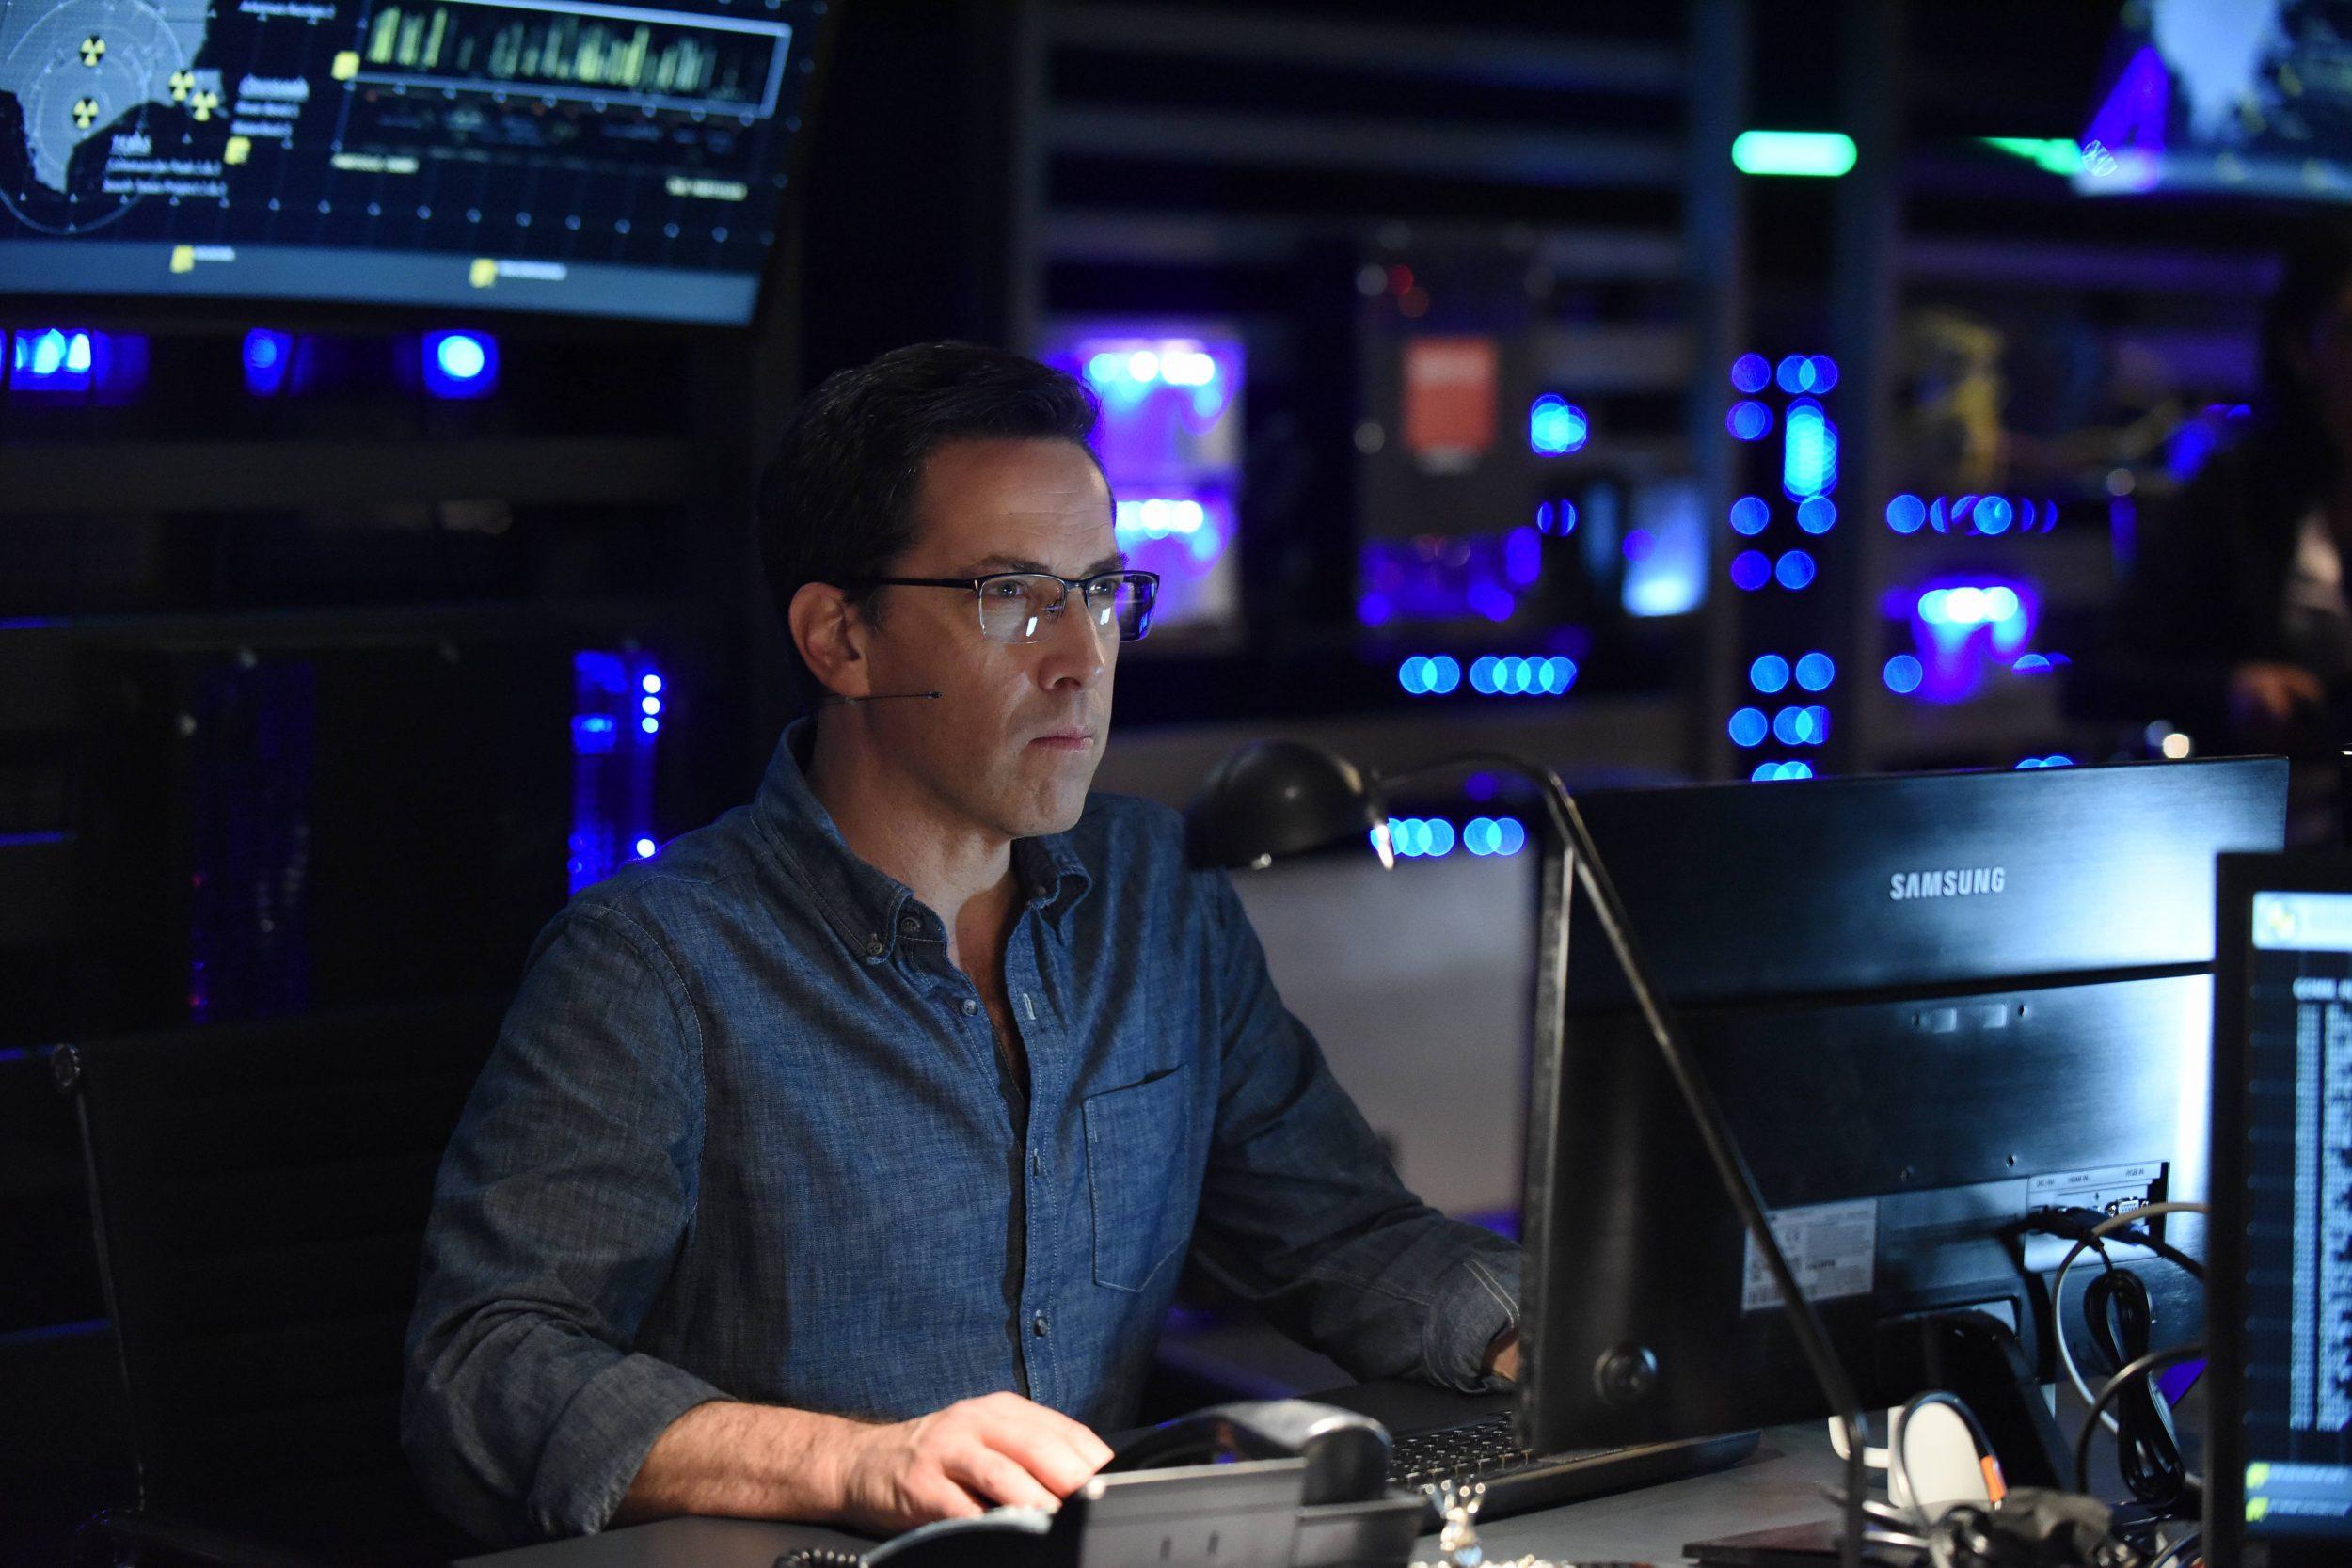 "24: LEGACY: Dan Bucatinsky. 24: LEGACY begins its two-night premiere event following ""SUPERBOWL LI"" on Sunday, Feb. 5, and will continue Monday, Feb. 6 on FOX. ©2016 Fox Broadcasting Co. Cr: Ray Mickshaw/FOX"